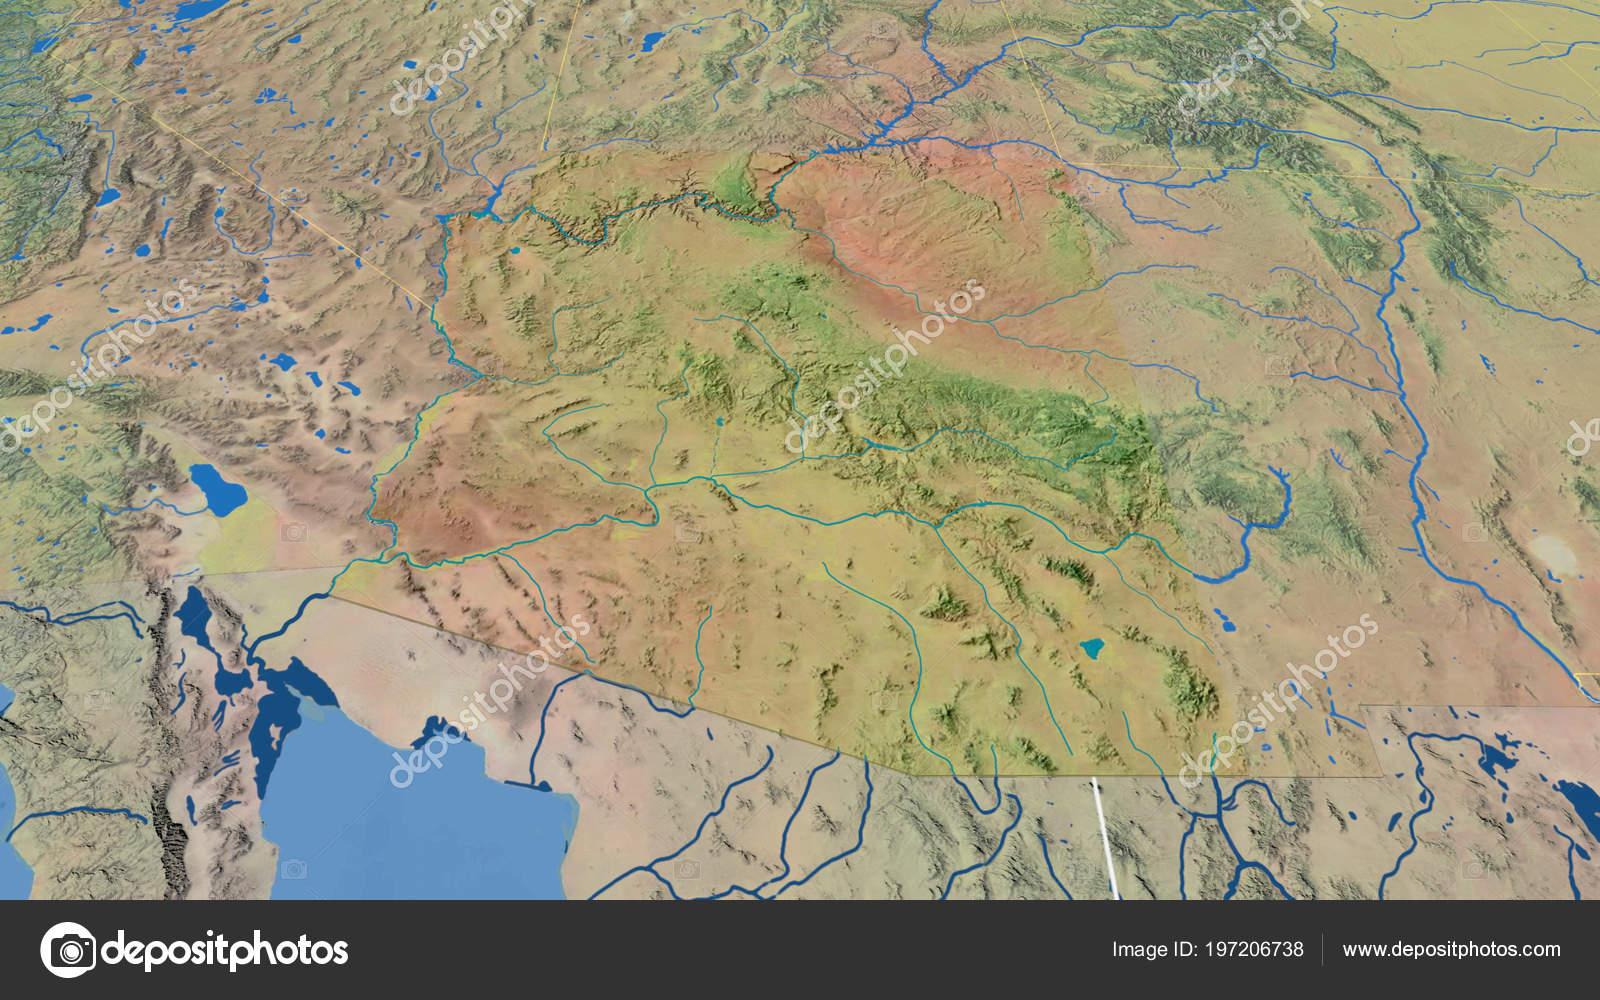 Topographic Map Arizona.Arizona Region United States Extruded Topographic Map Stock Photo